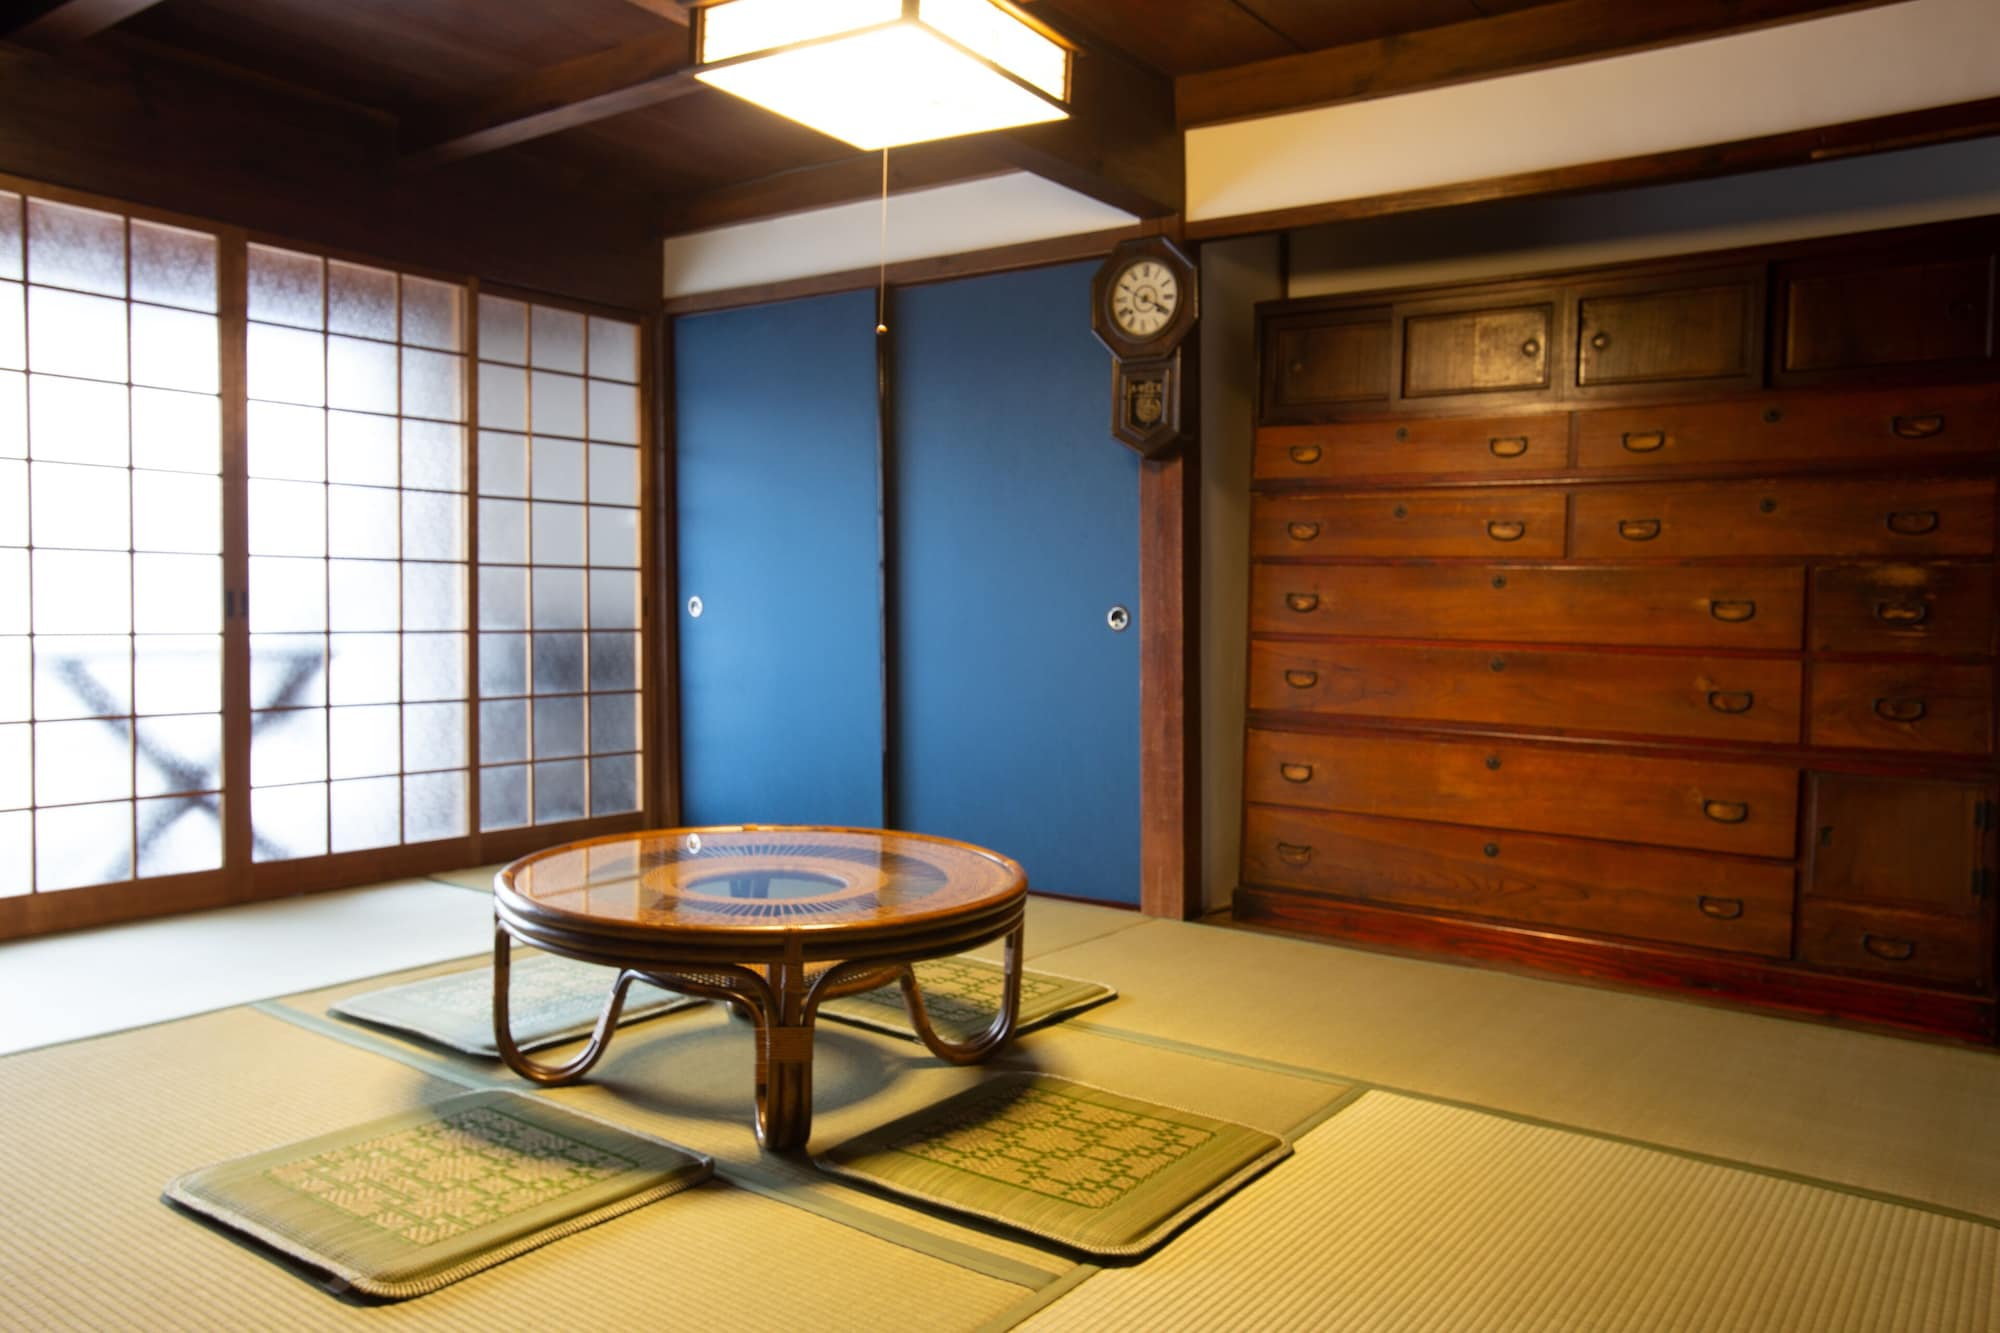 Chikugoyoshii Machiyayado Ikuha, Ukiha